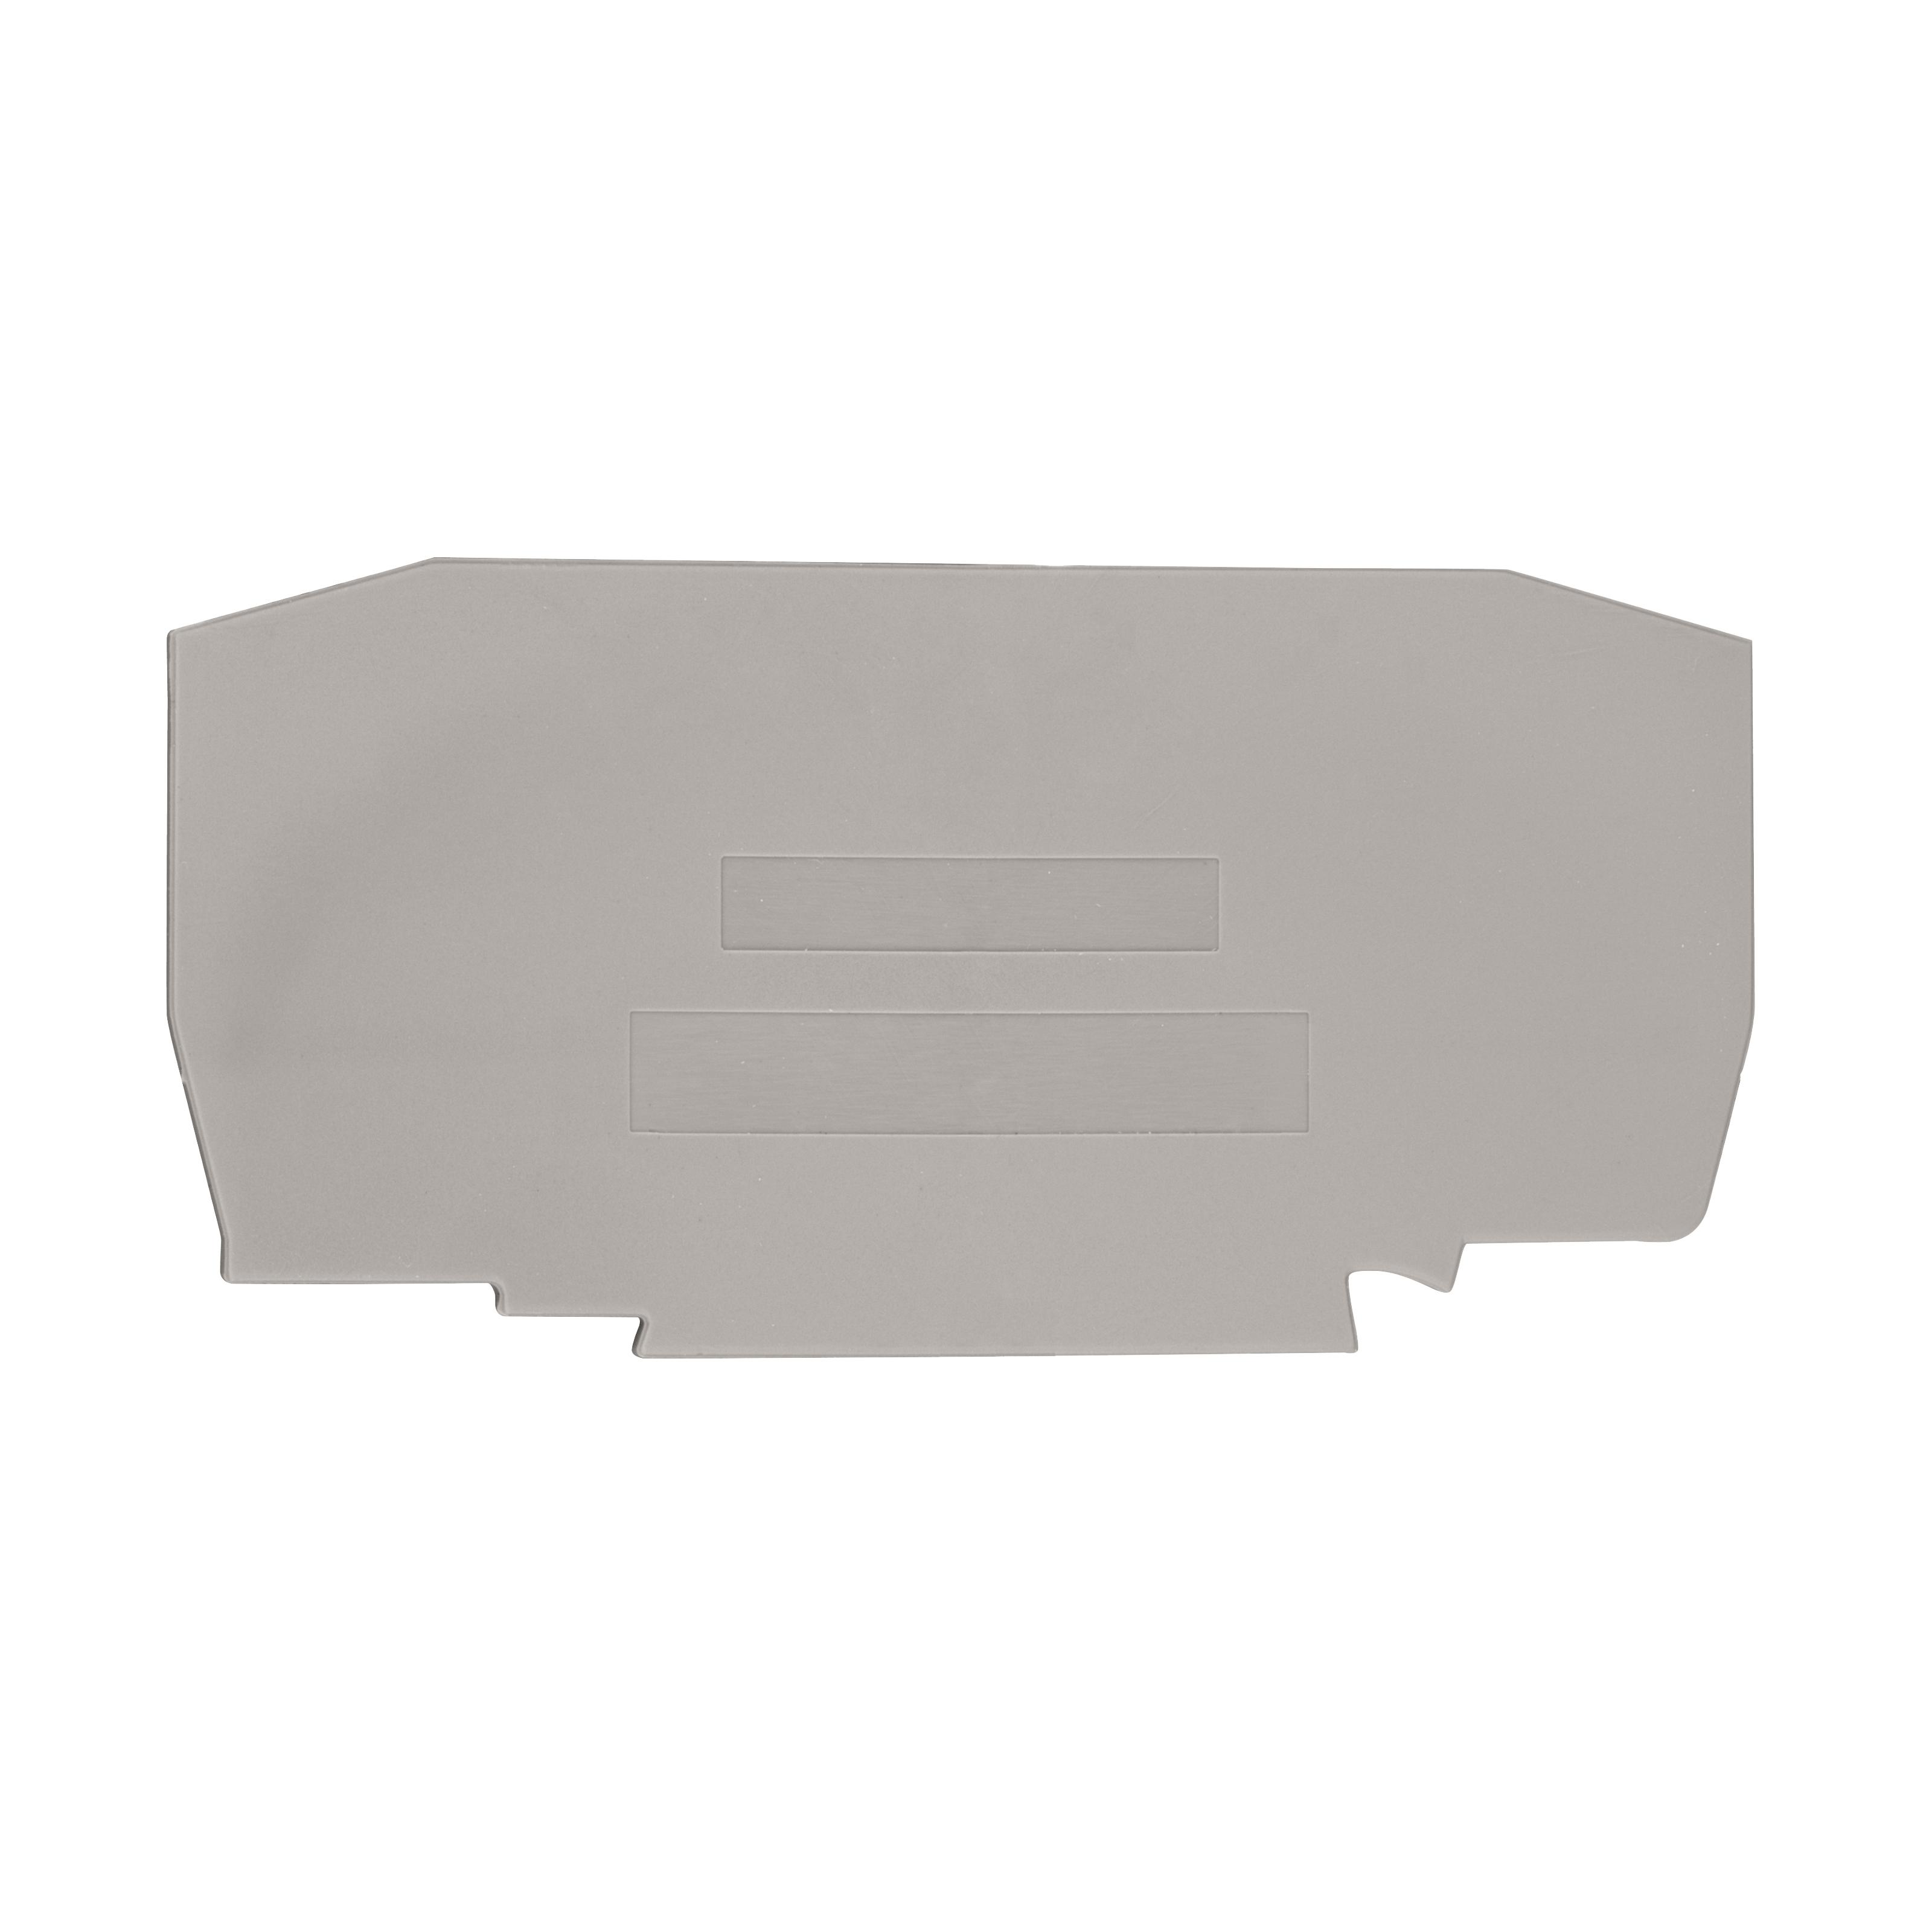 1 Stk Endplatte für Federkraftklemme YBK 10 grau IK610210--